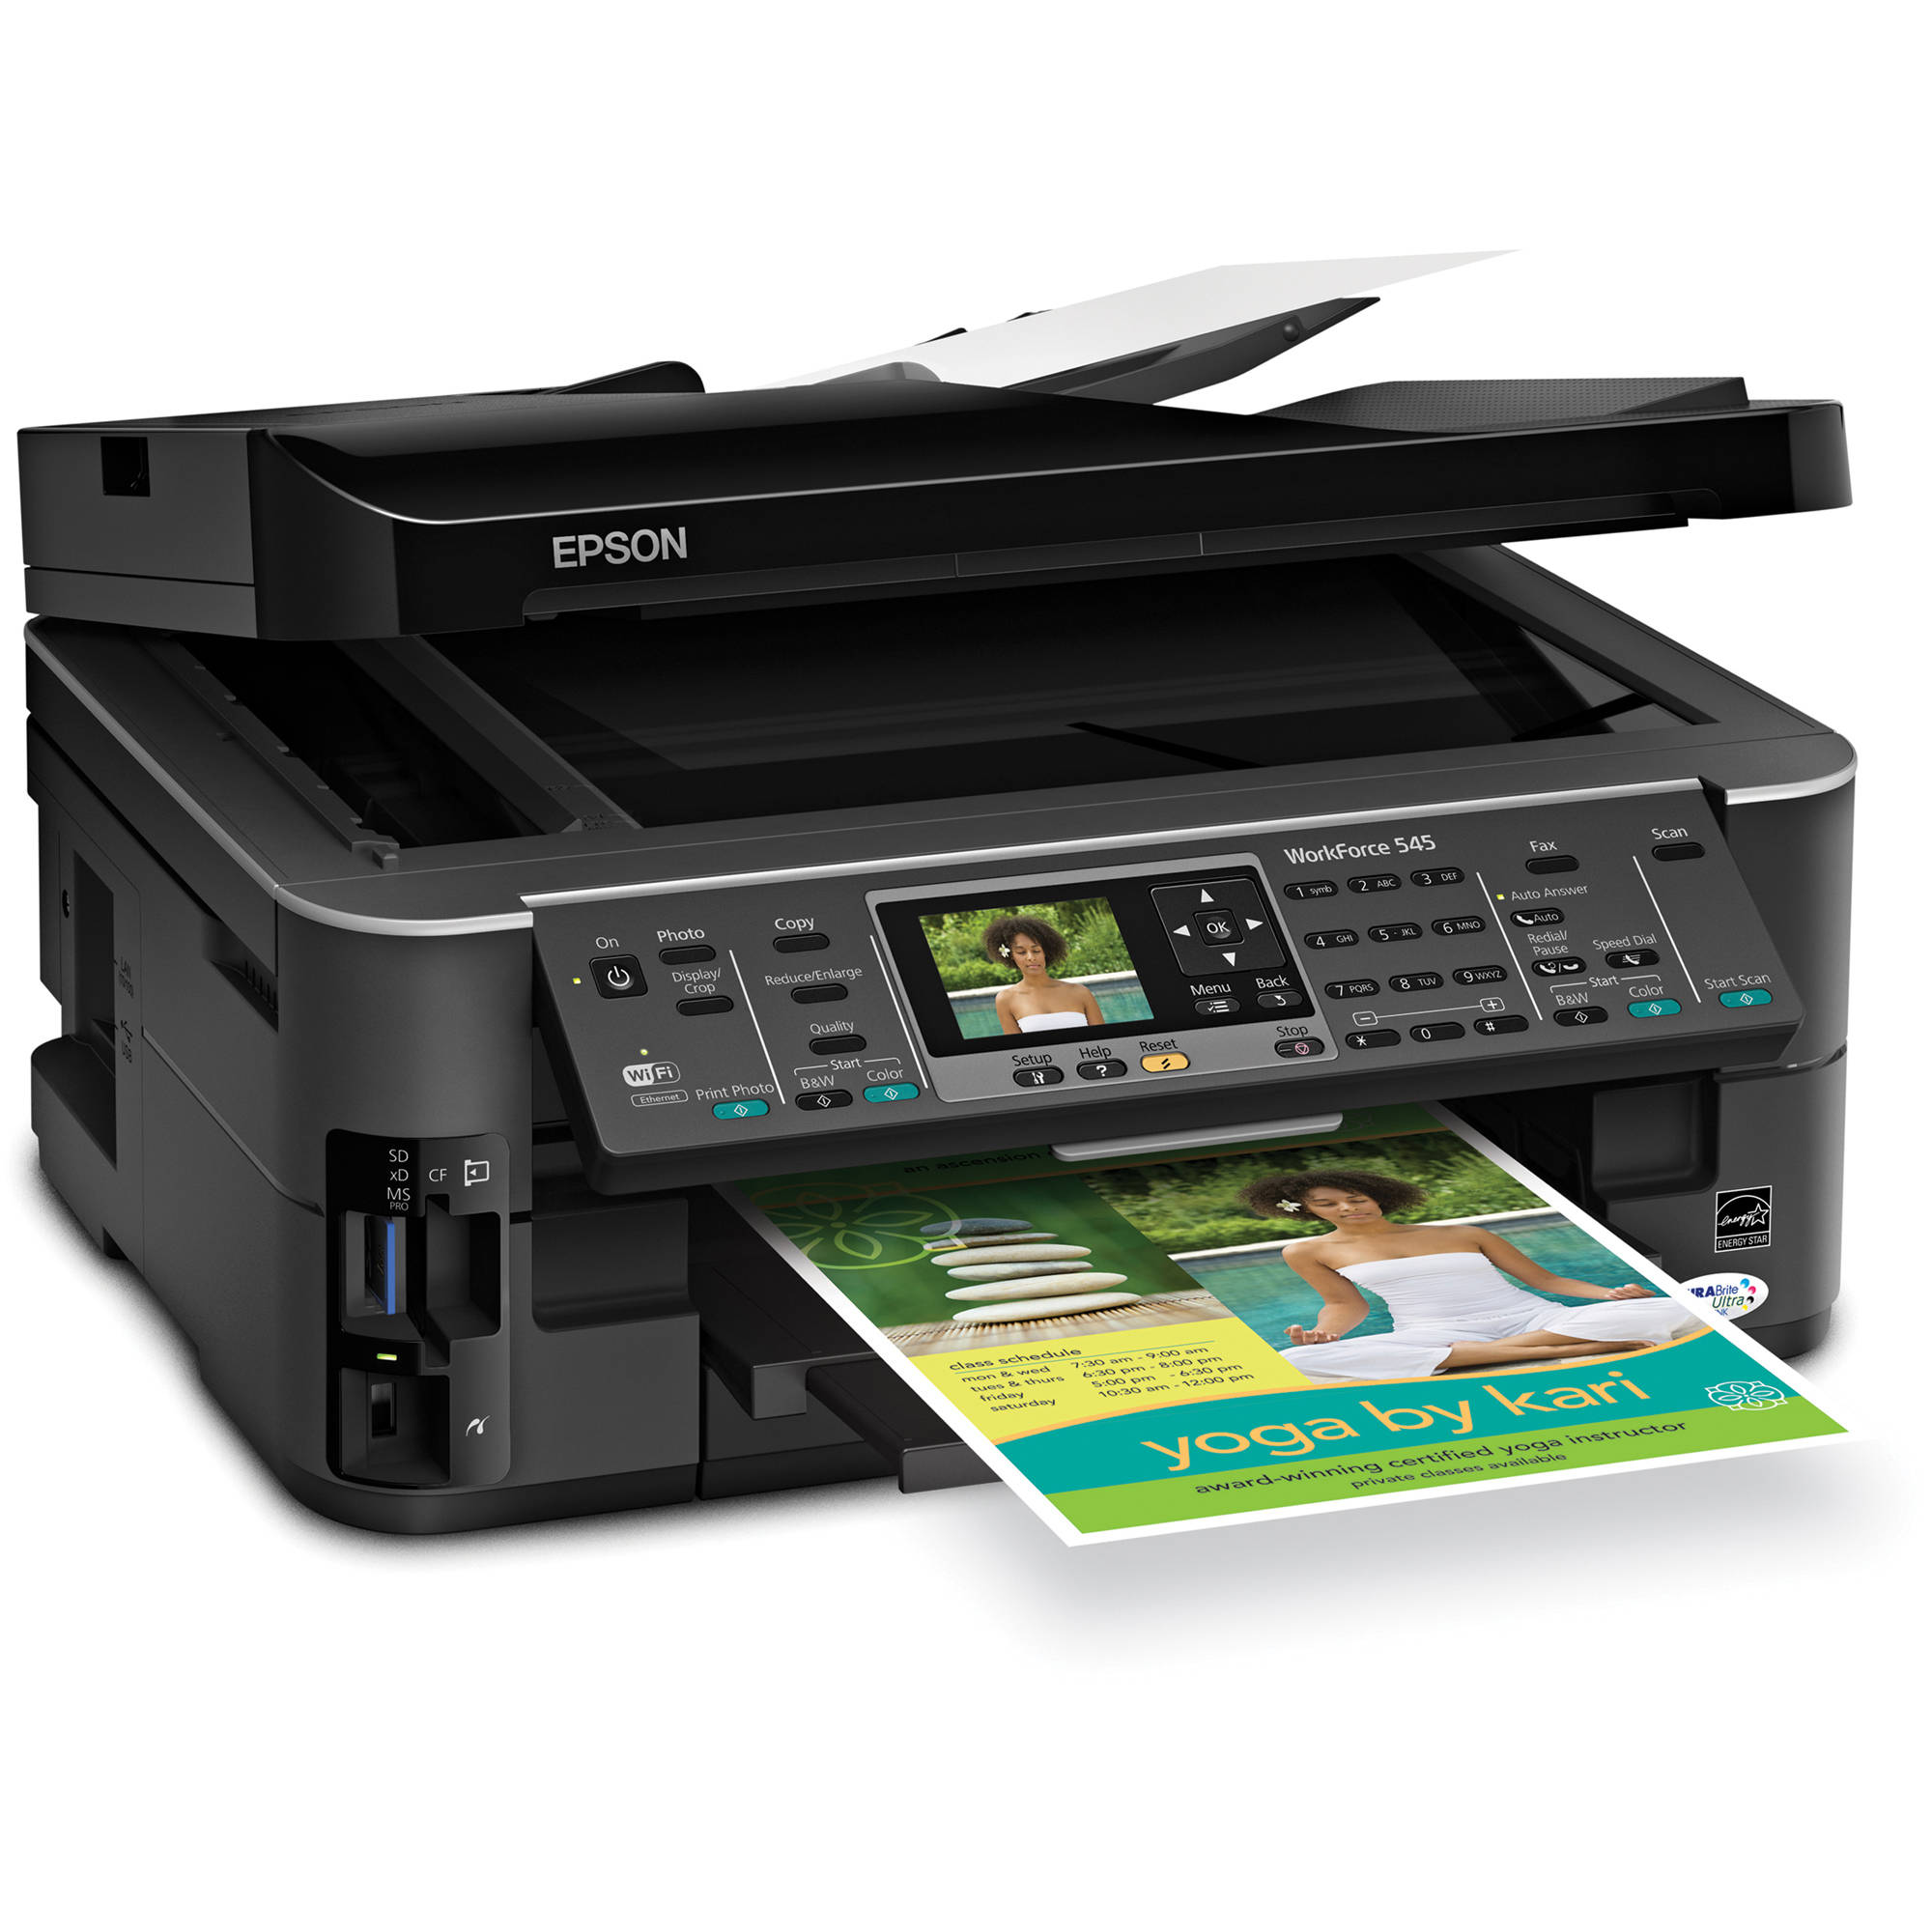 epson workforce 545 all in one color inkjet printer c11cb88201 rh bhphotovideo com